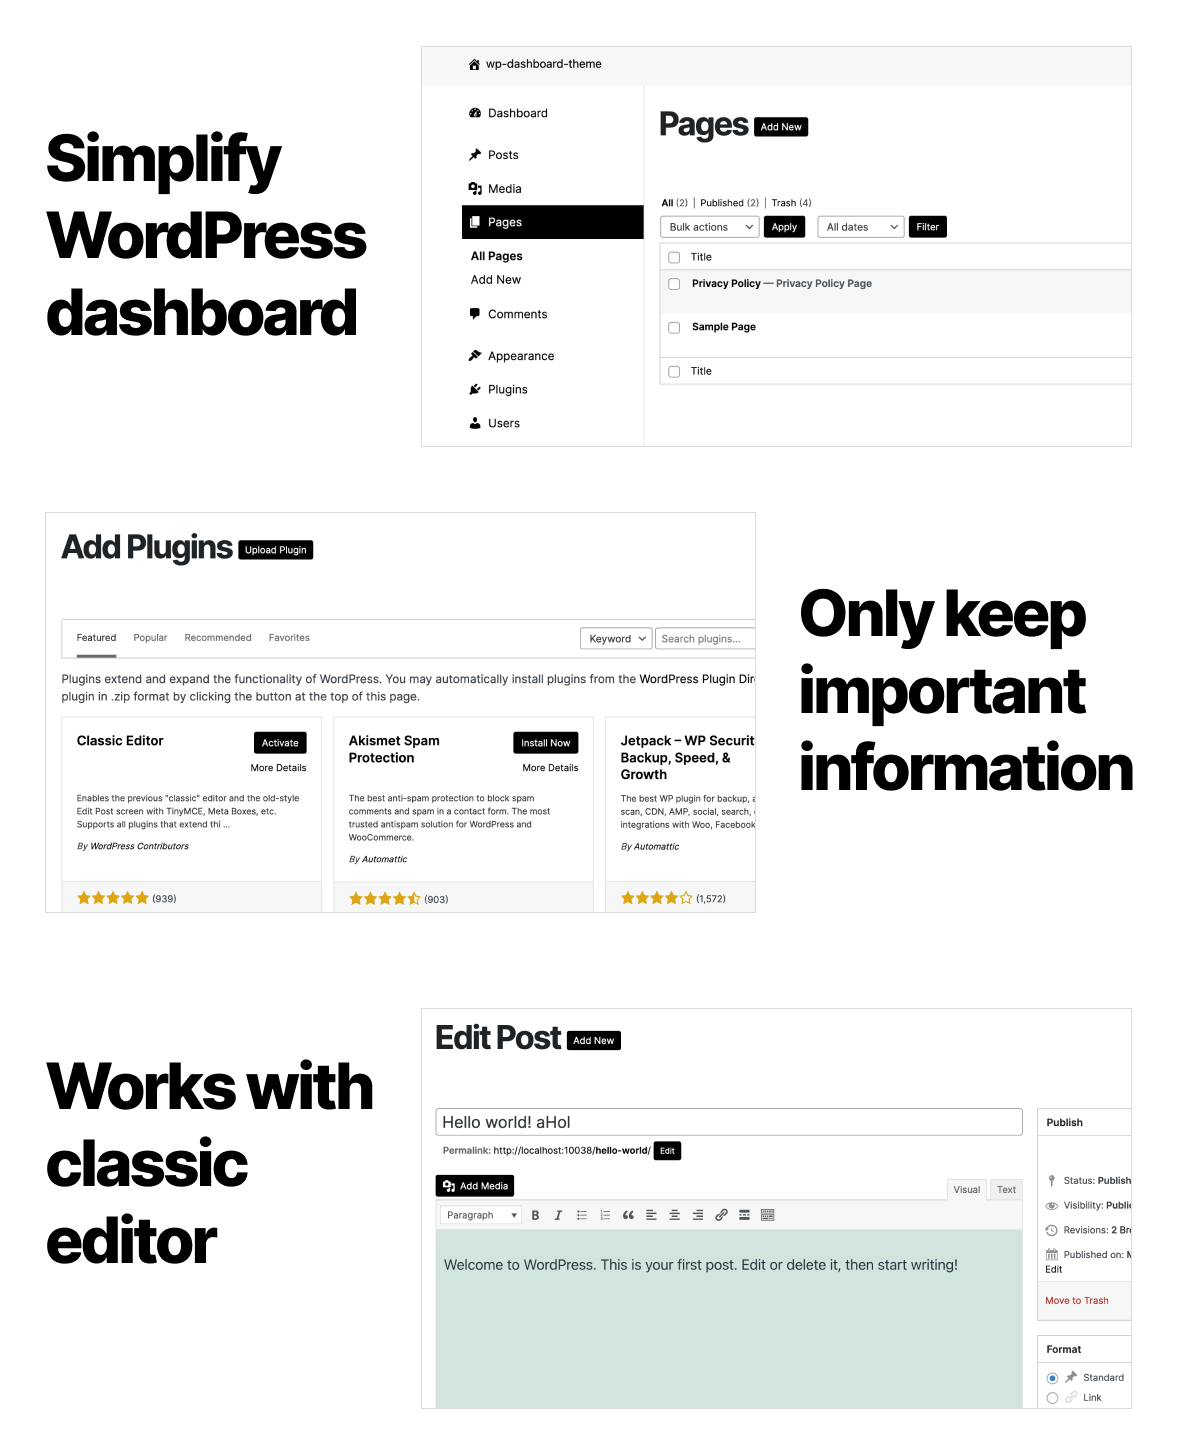 Simple Dashboard Theme / Admin Theme for WordPress - 1